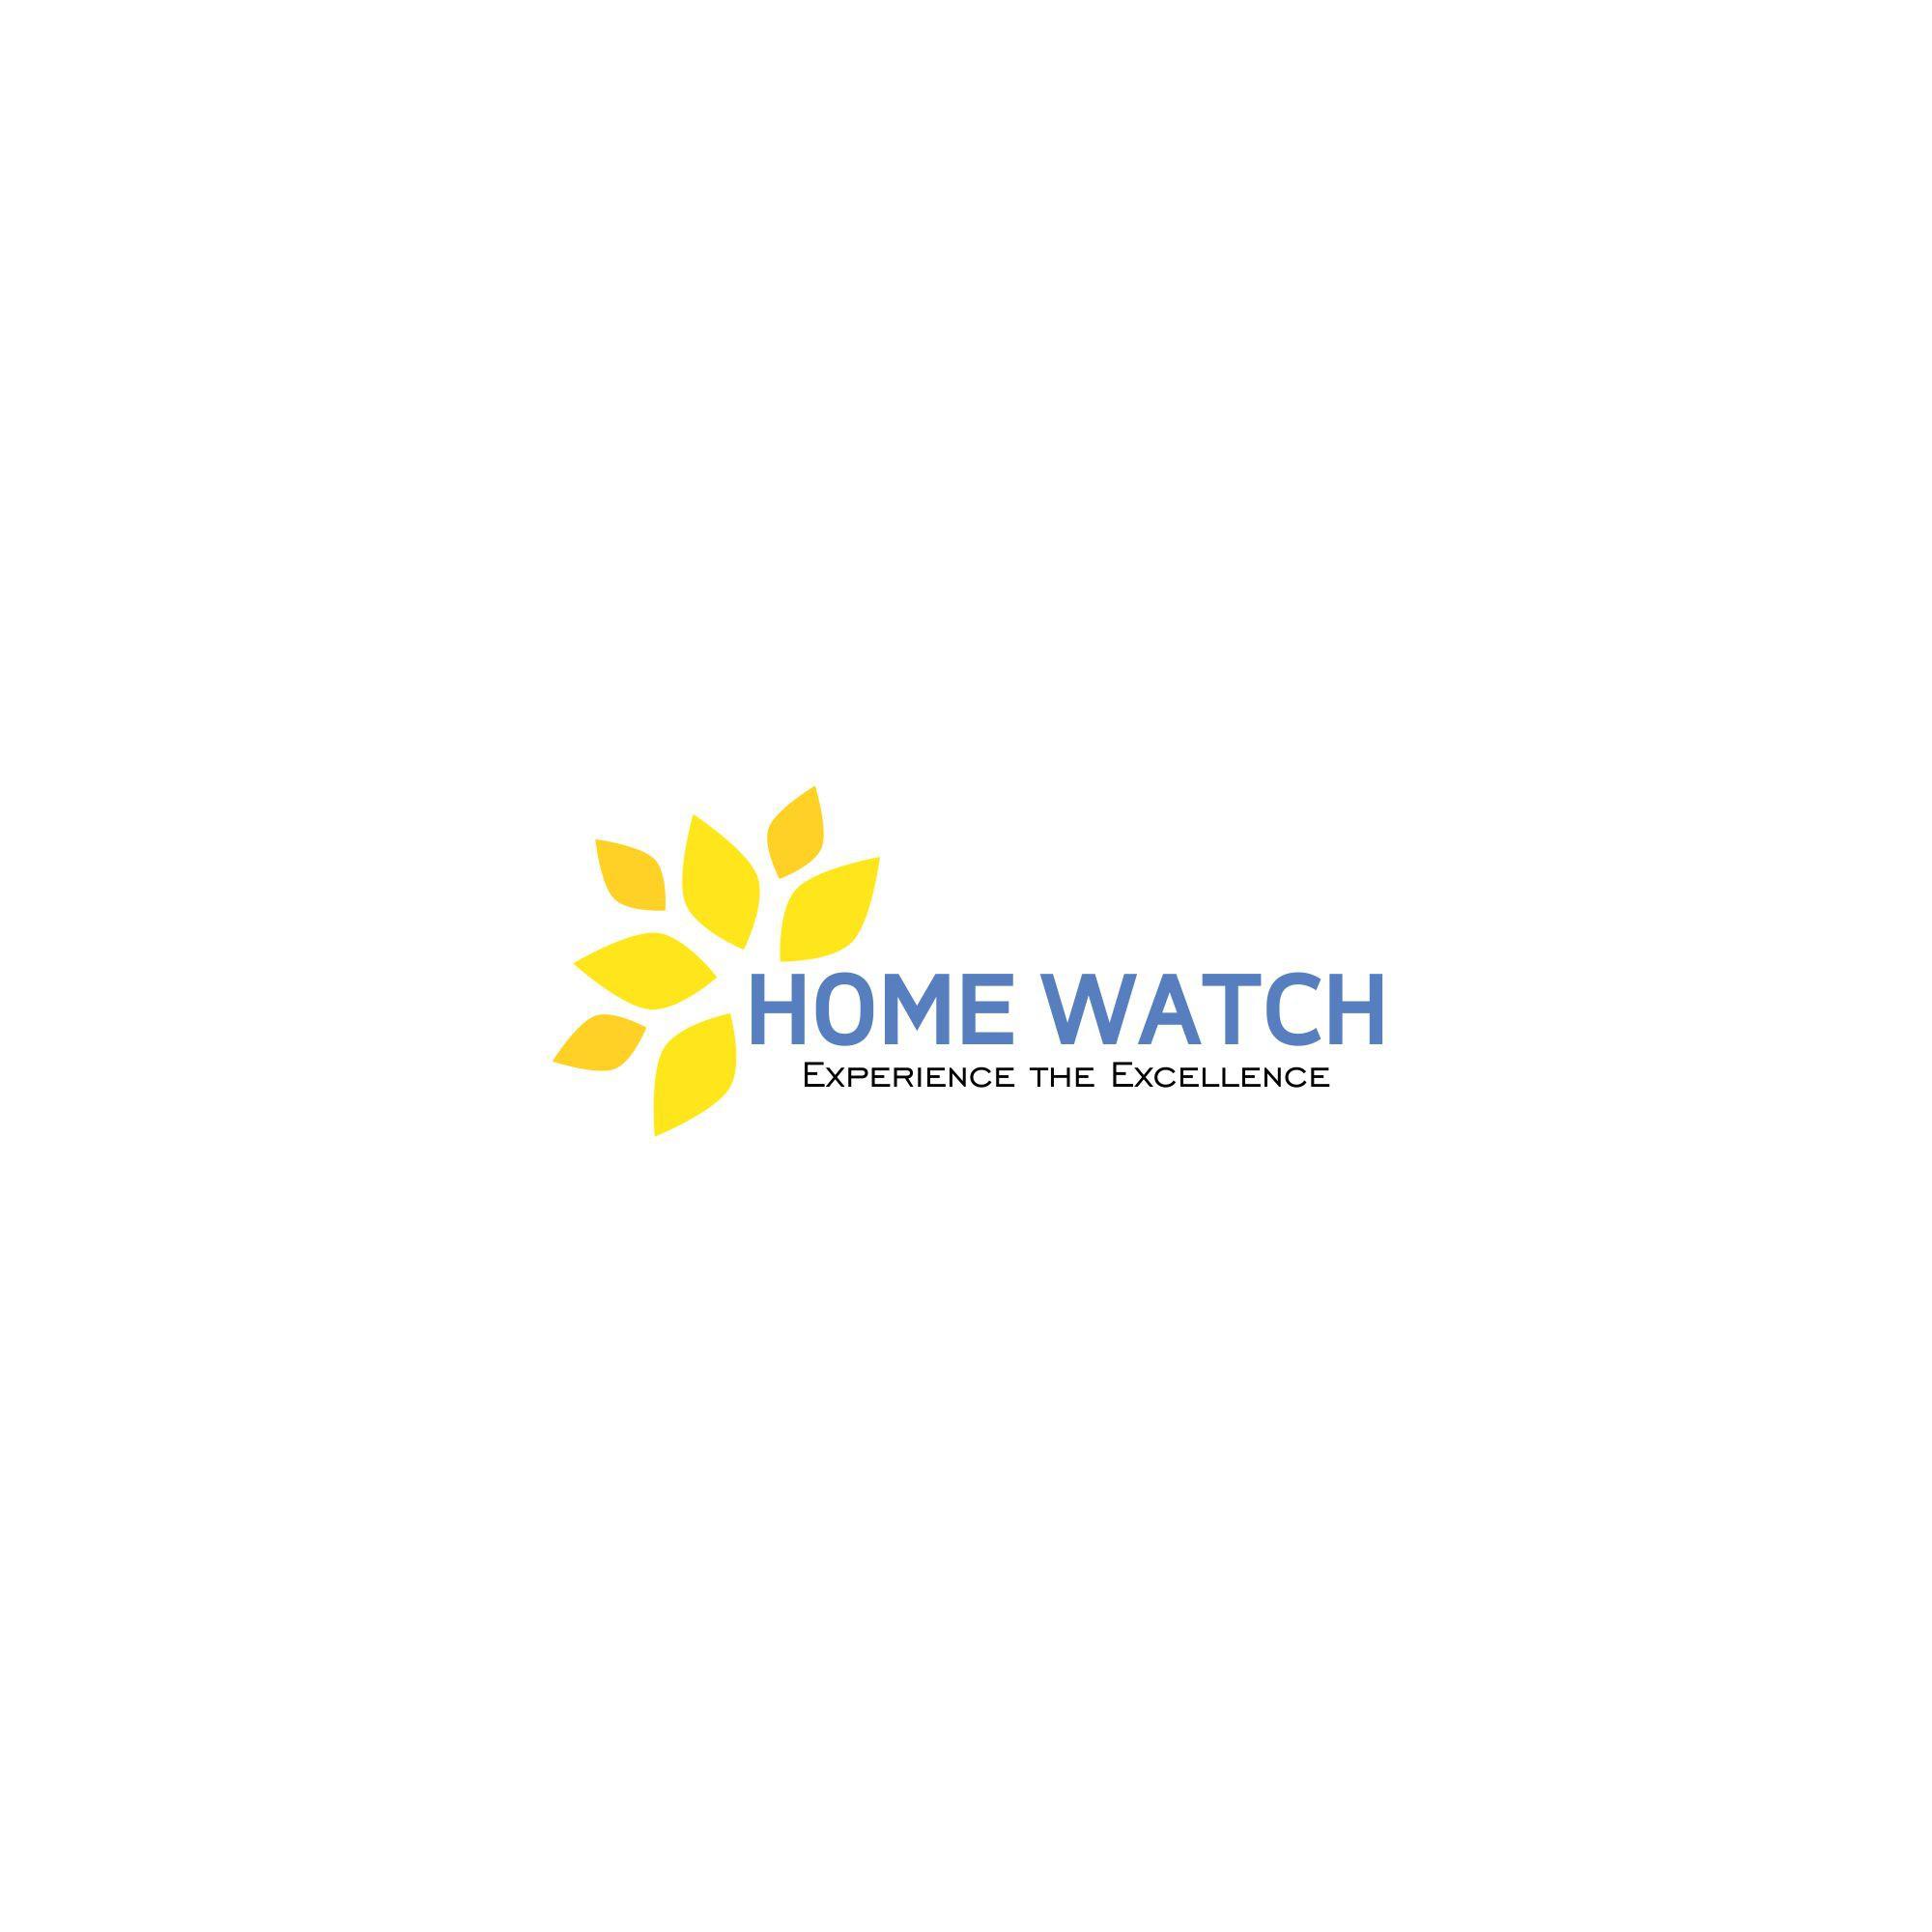 Create a inviting logo for florida vacation rental company